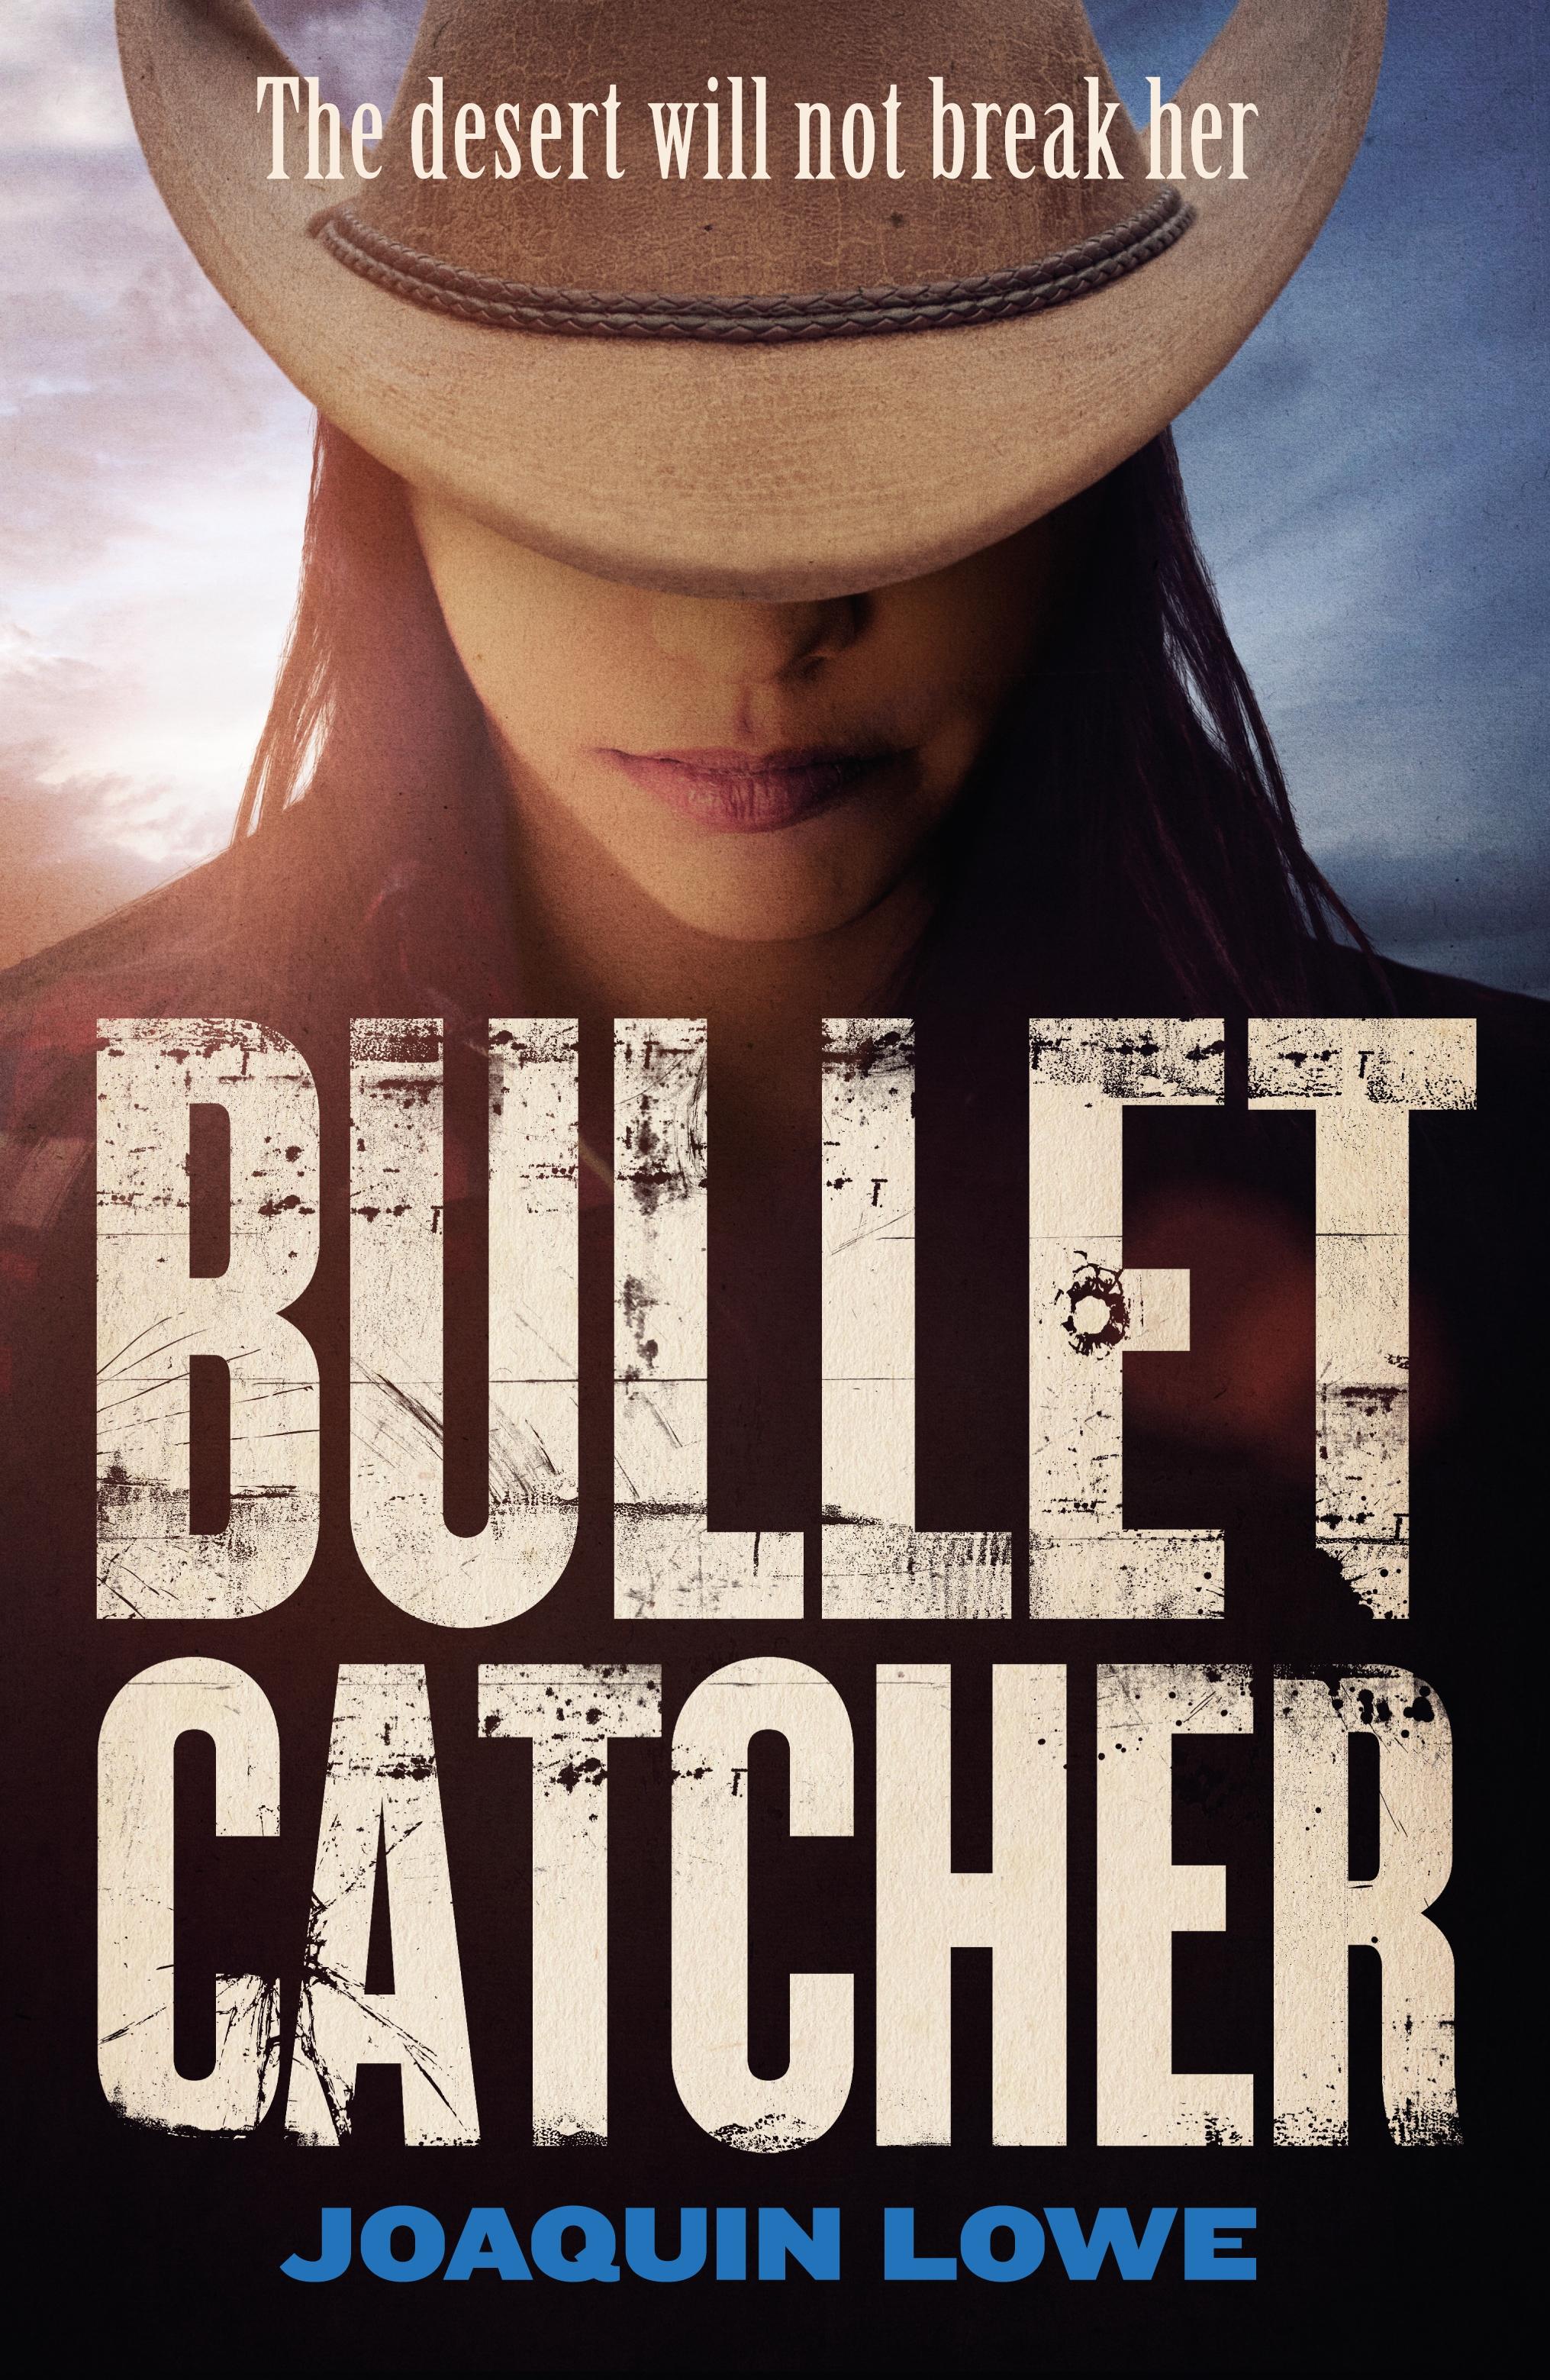 Bullet Catcher by Joaquin Lowe